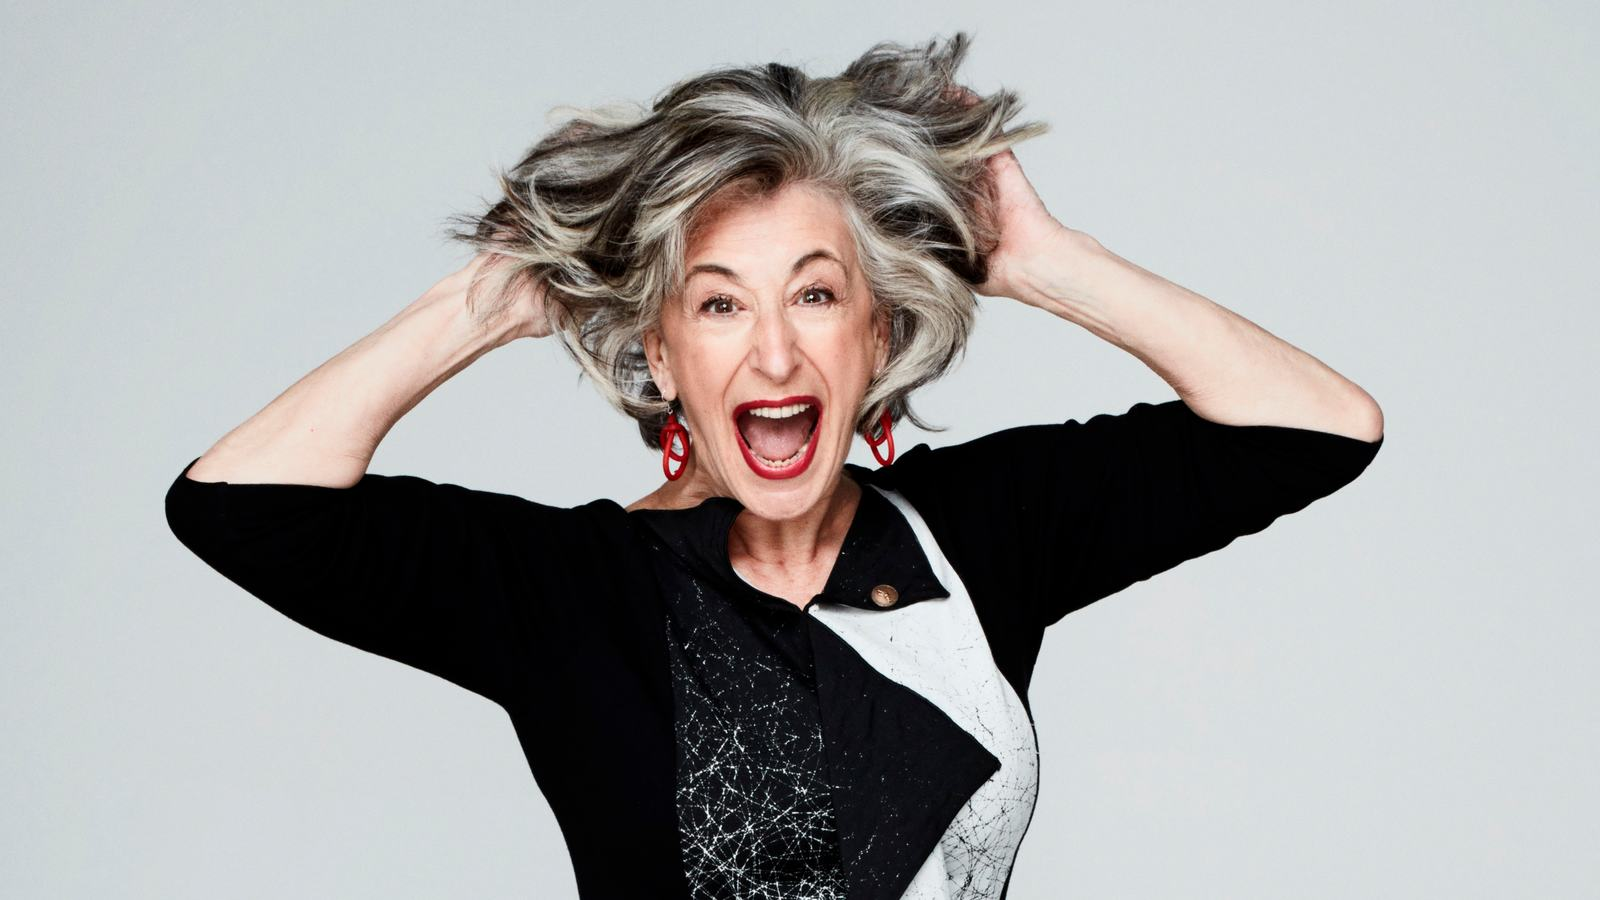 Maureen Lipman, actress, columnist, and comedian